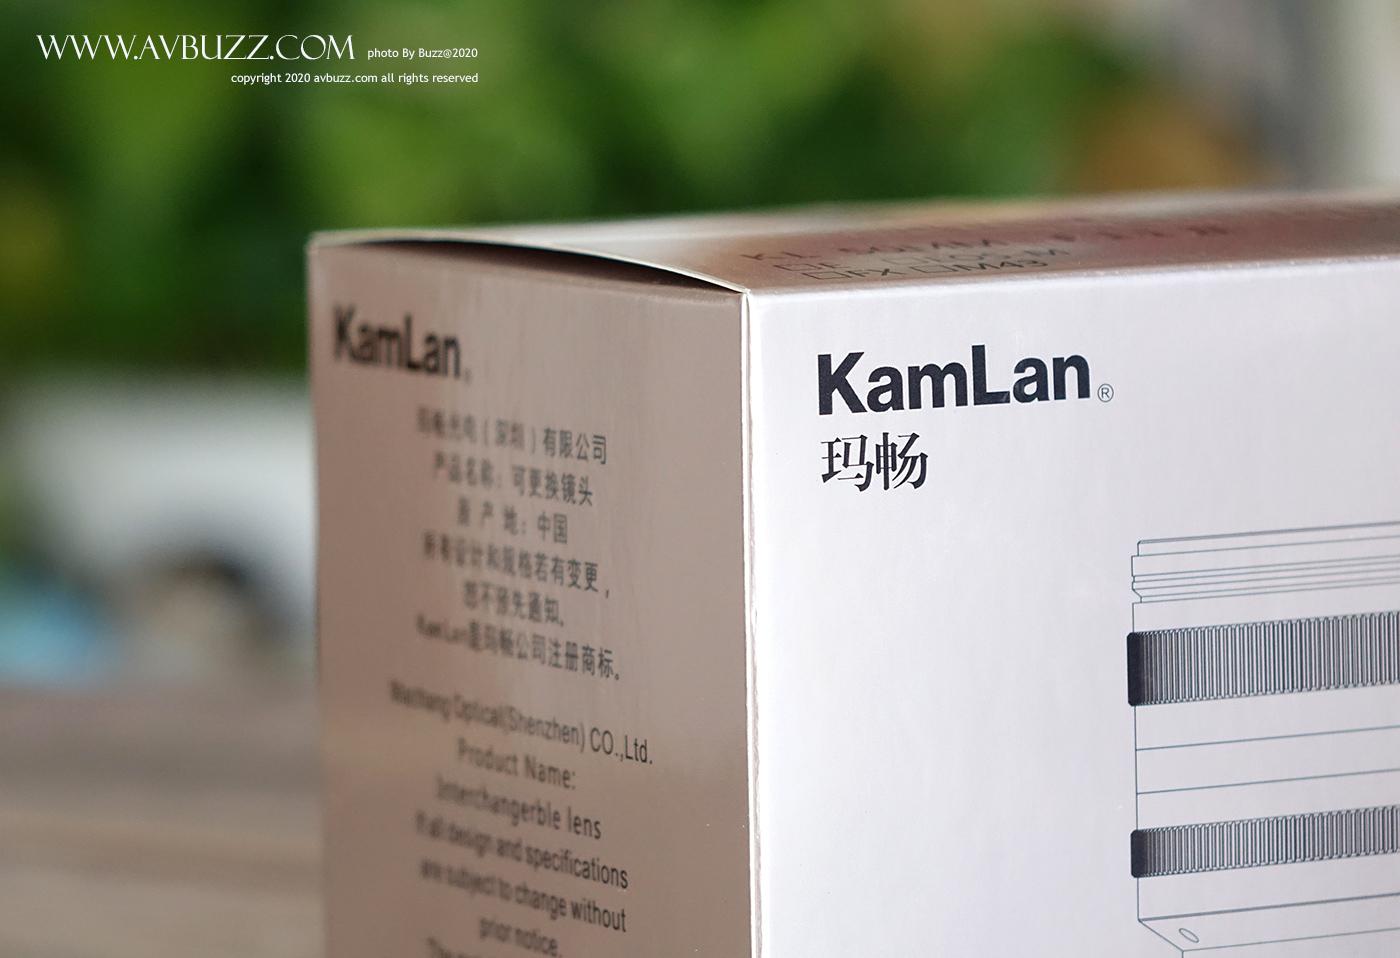 Kamlan 50mm 1.1-S00007